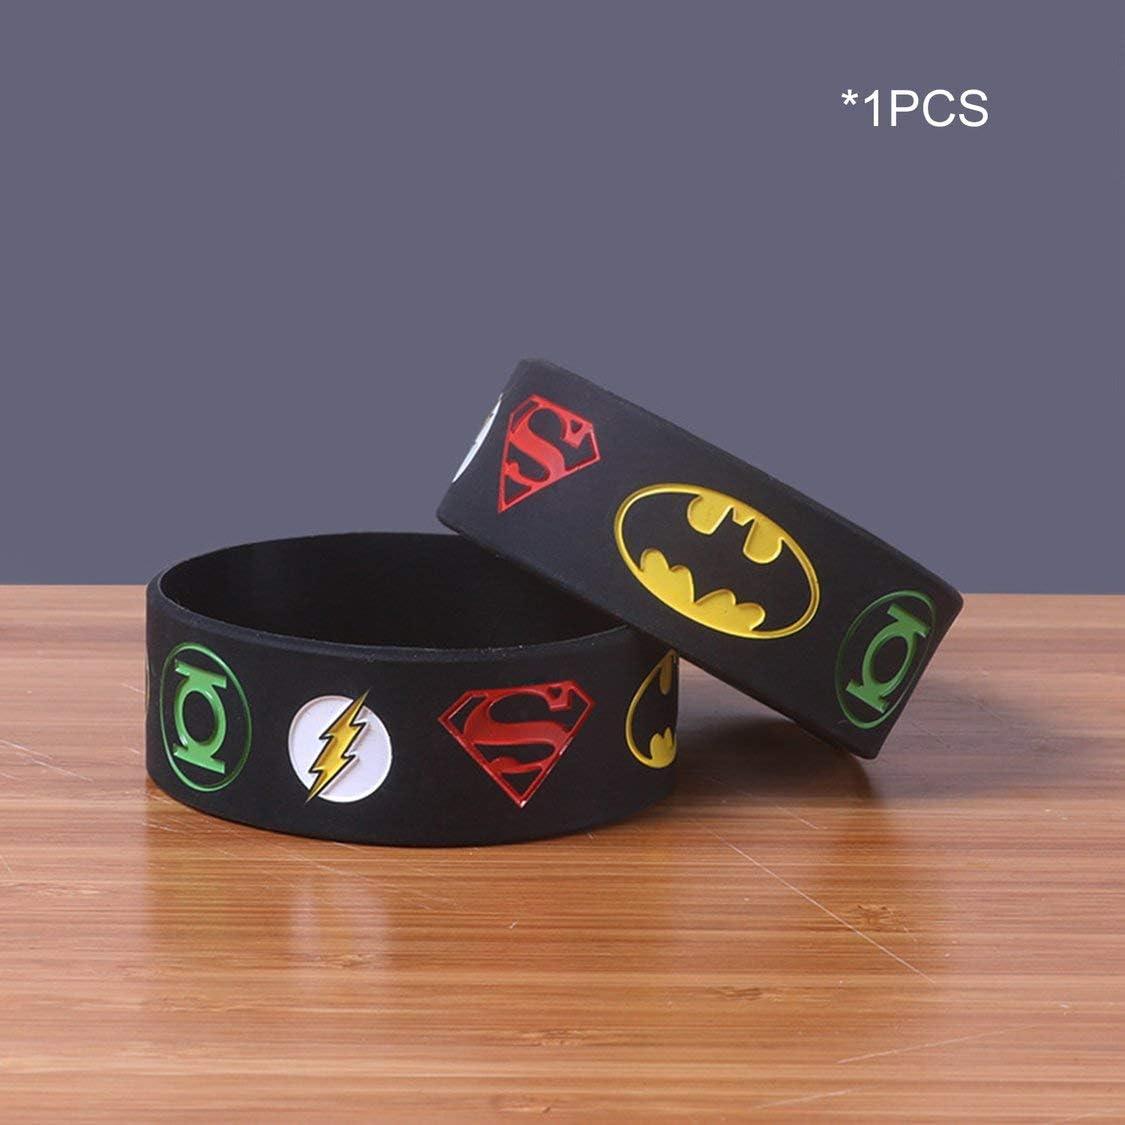 FancysweetyFR Superhero Bracelets Batman Superman Superheroes Logos Silicone Bracelets Bracelet Bracelet Sport Cadeau D/écoration